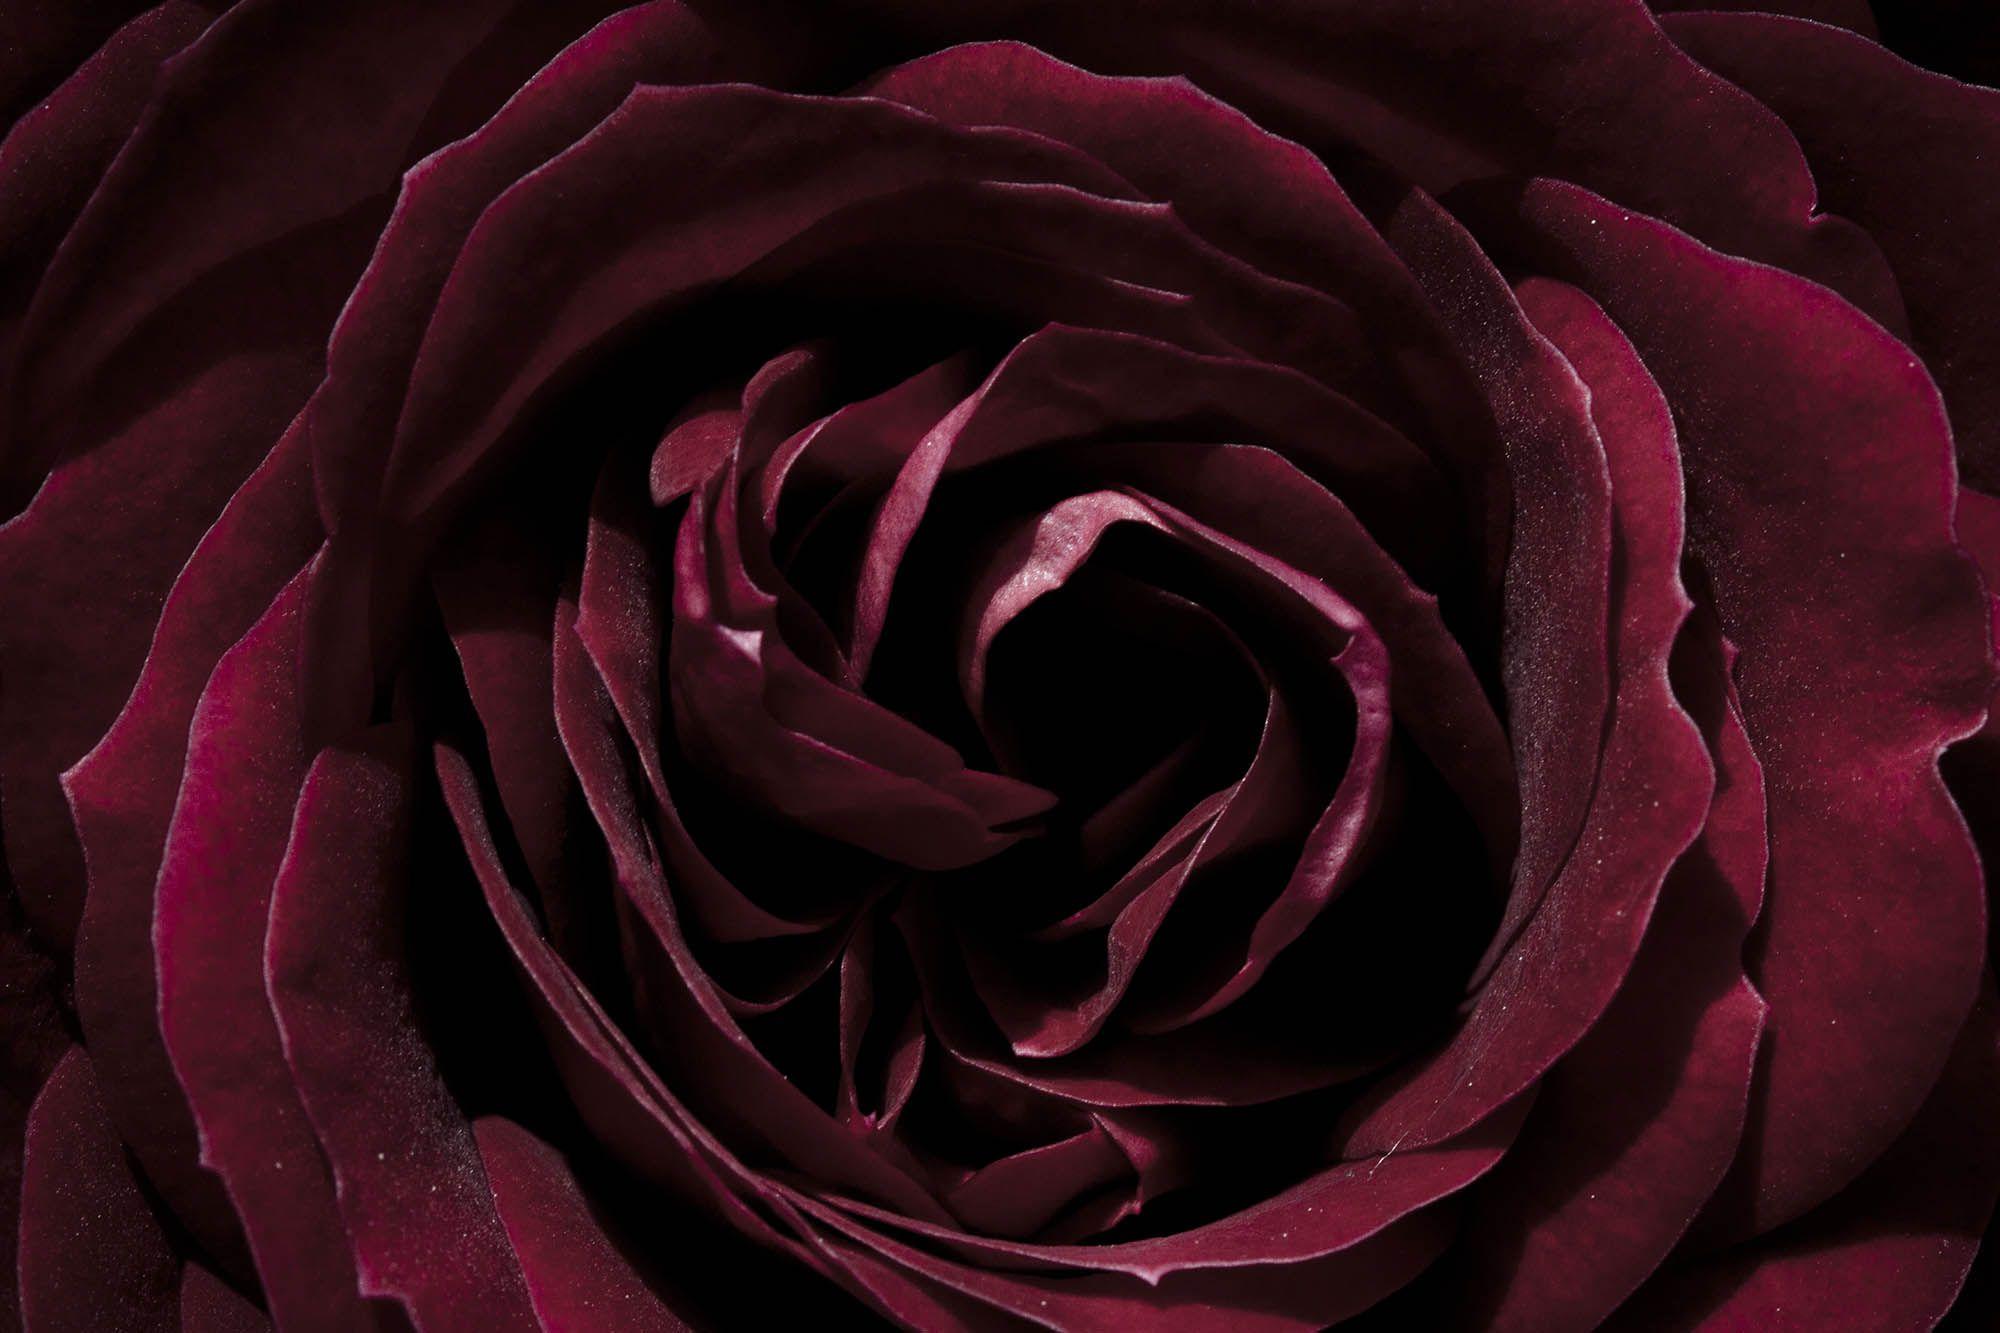 Rose Blume Rot Weinrot Bordeaux Dunkelrot Floristik